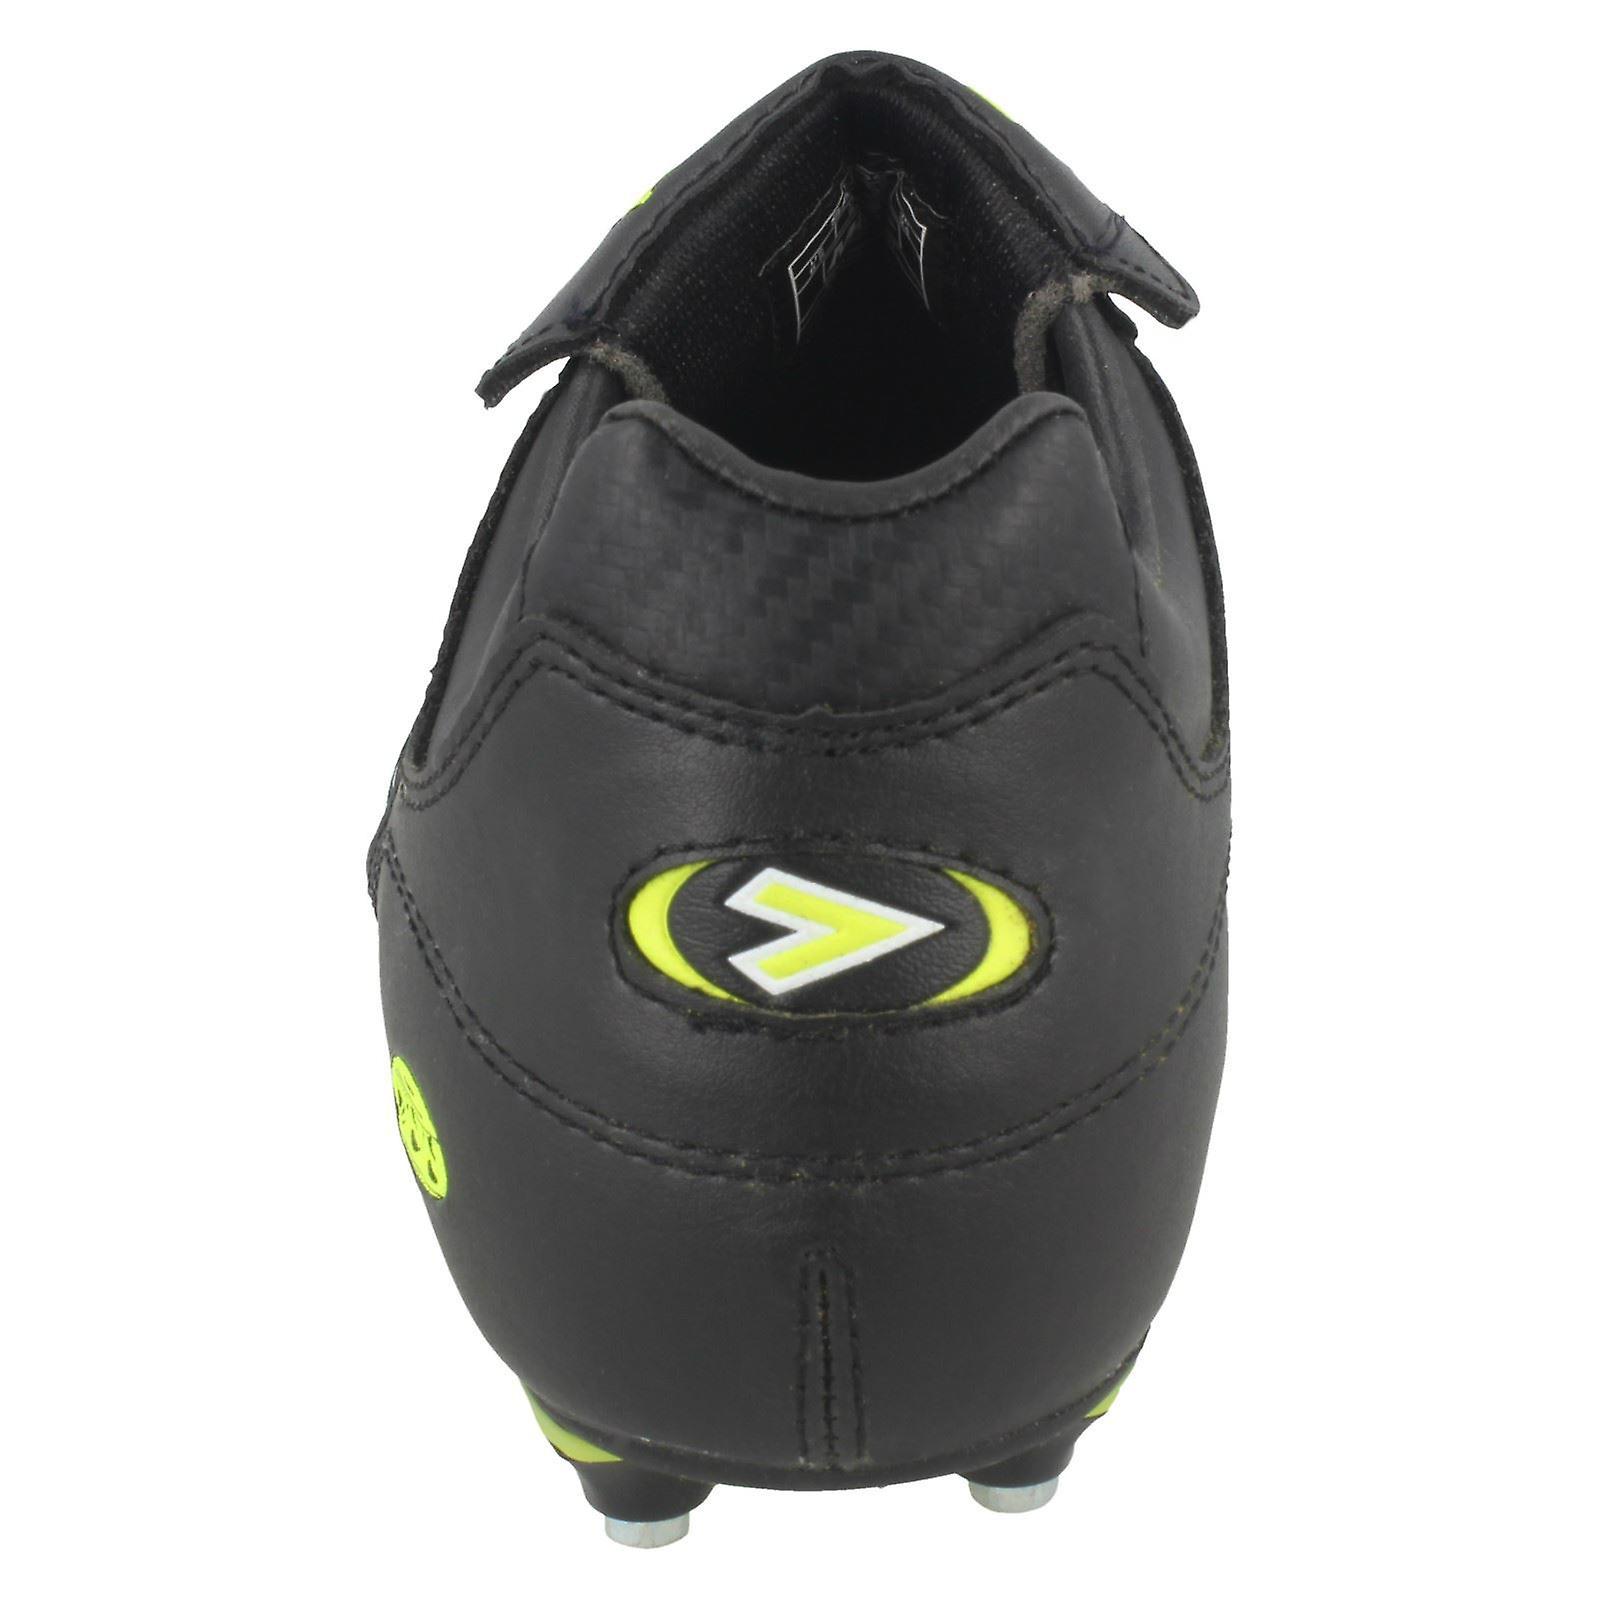 Fotballsko For Junior Gutter 'salvador'